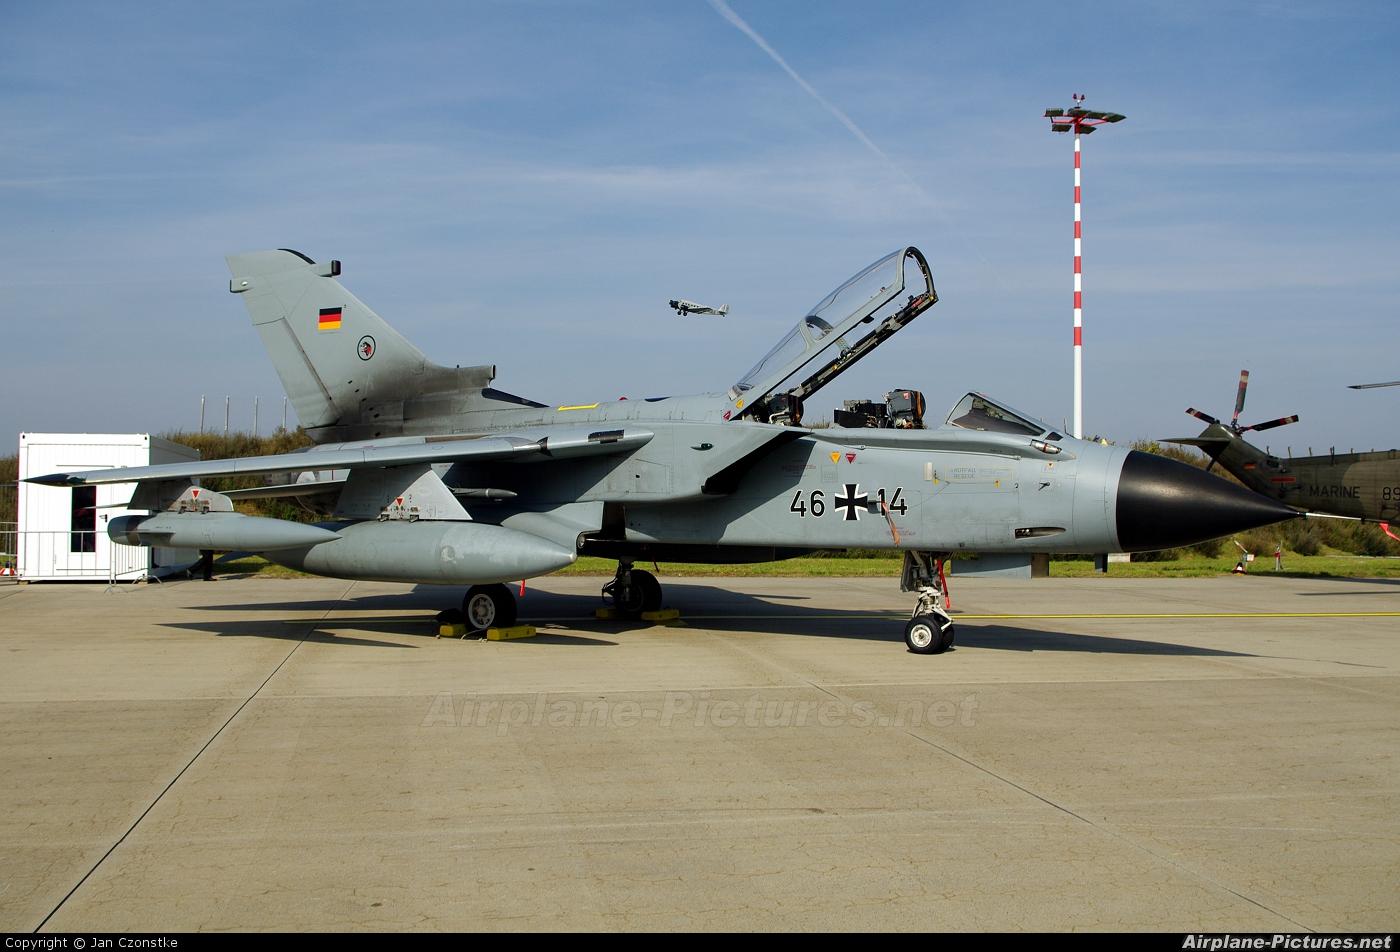 Germany - Air Force 46+14 aircraft at Hamburg - Fuhlsbüttel